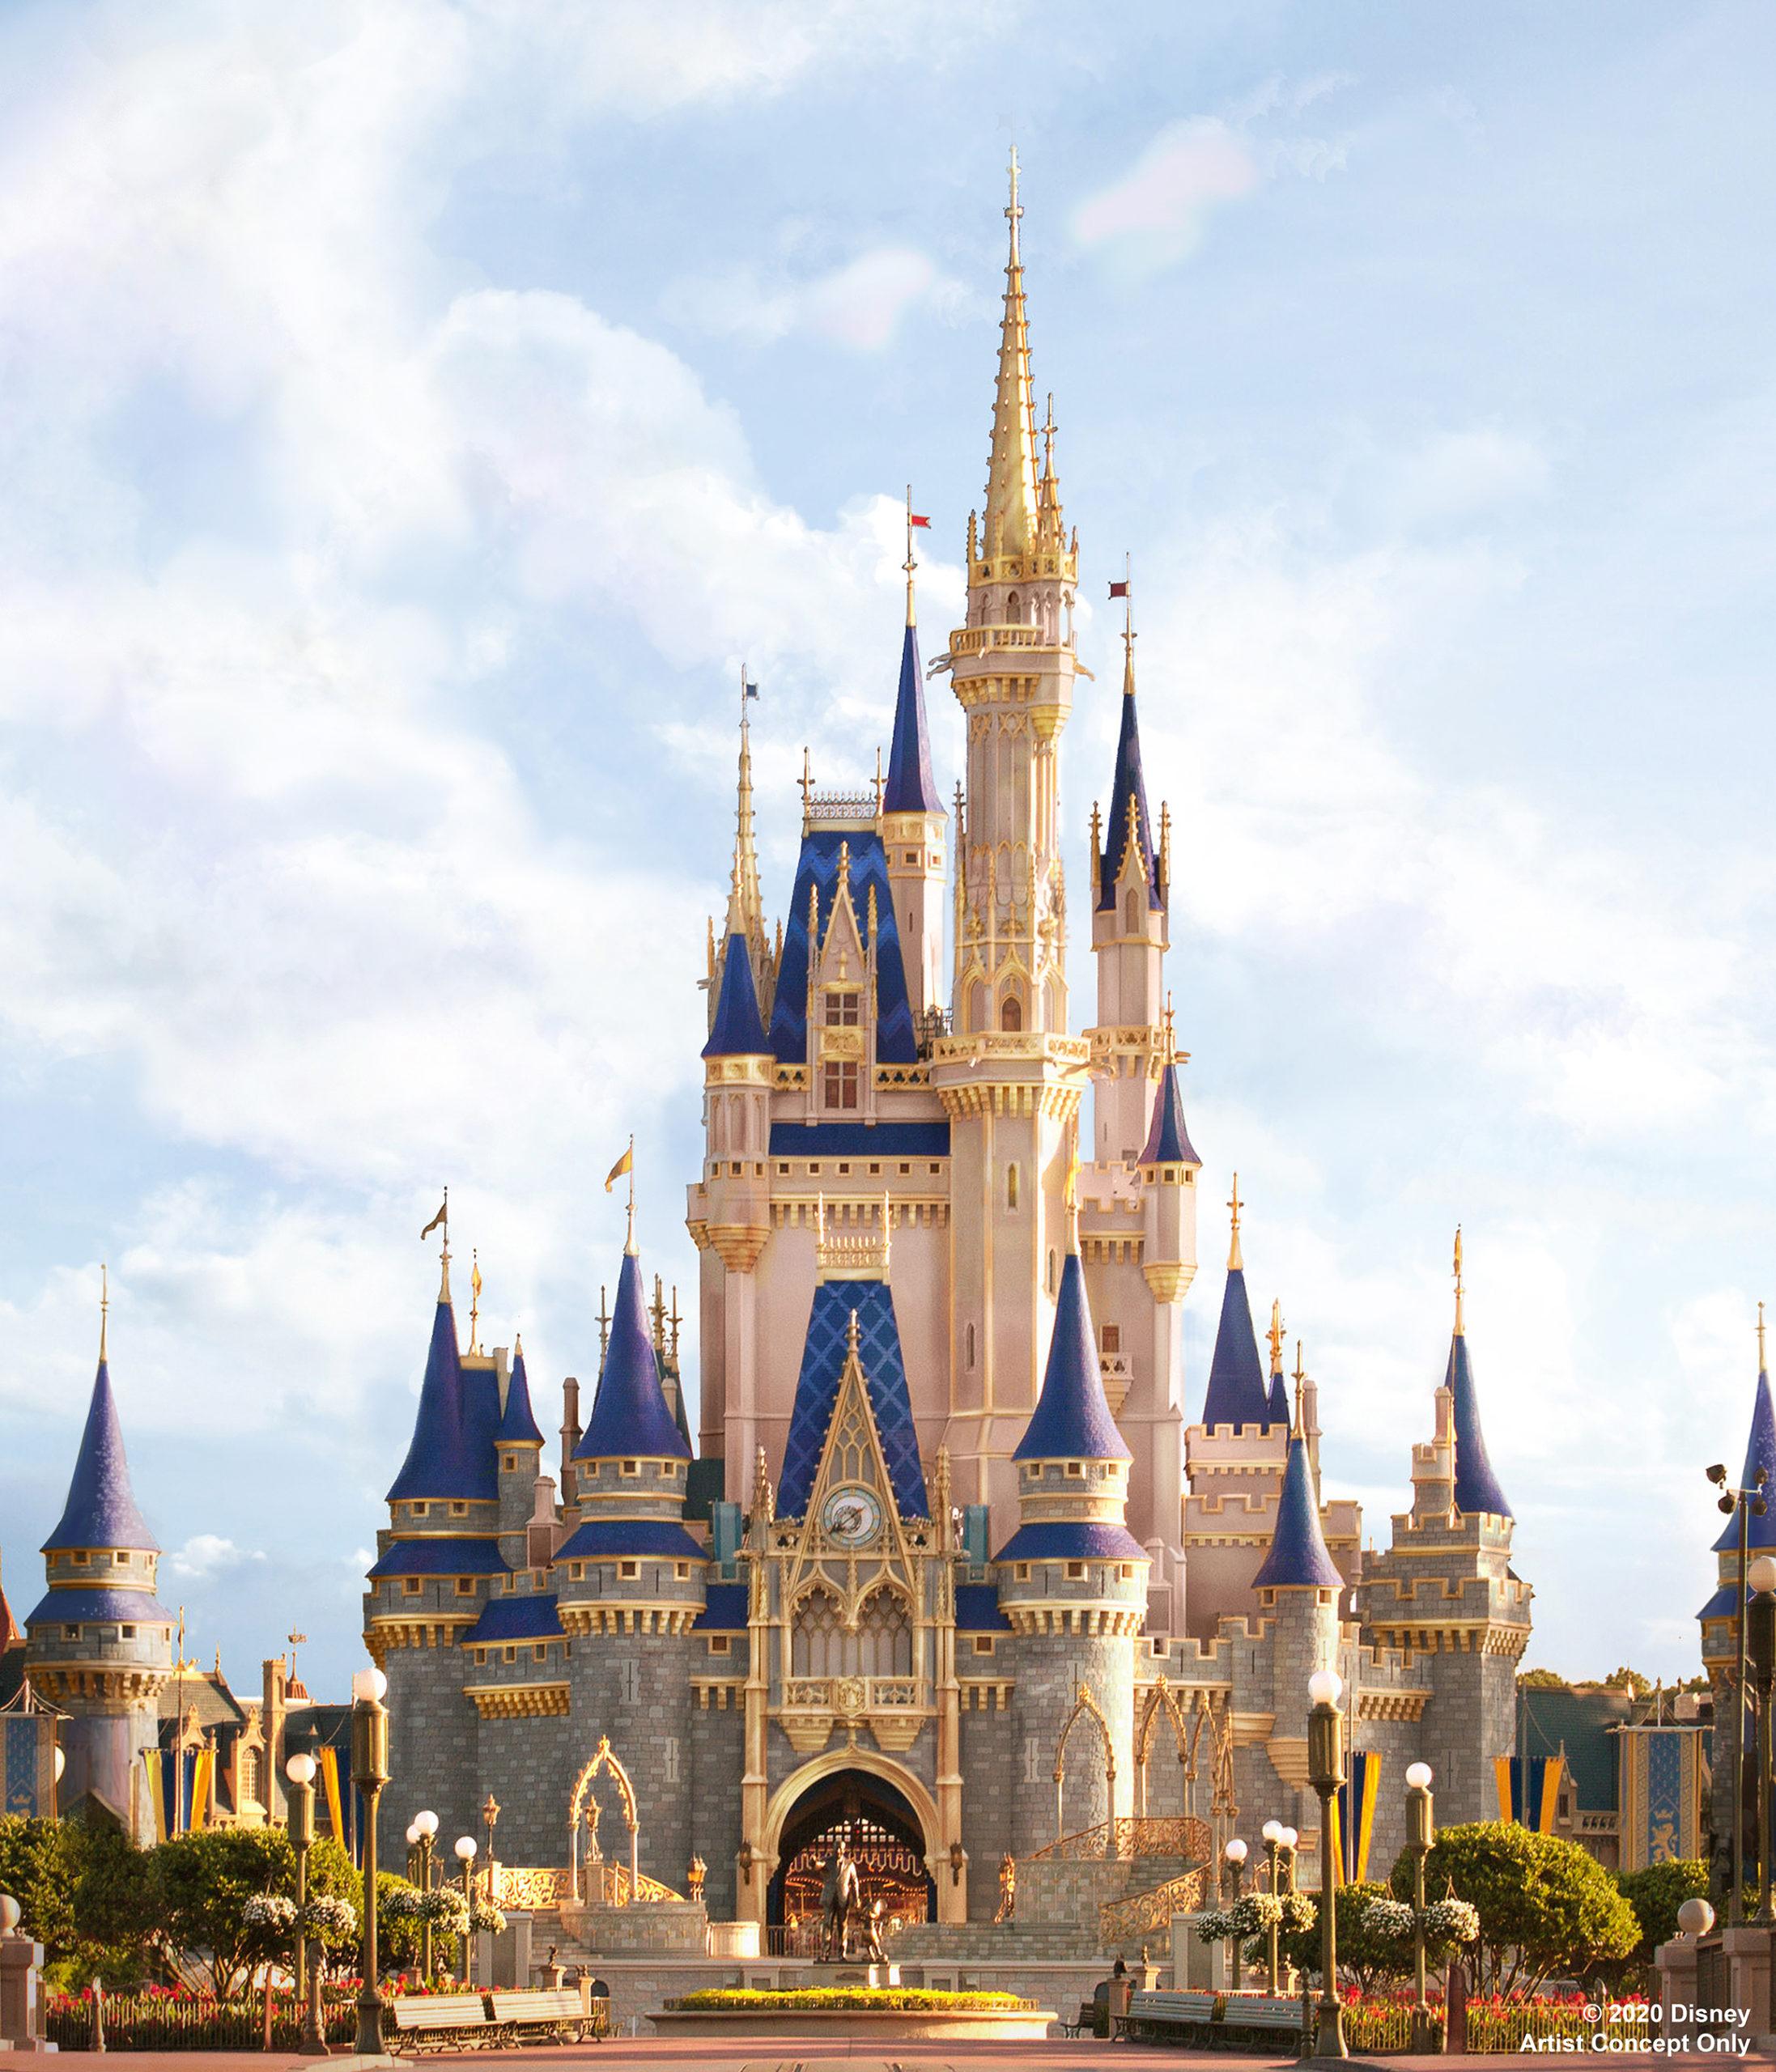 Cinderella Castle - Walt Disney World - 50th Anniversary